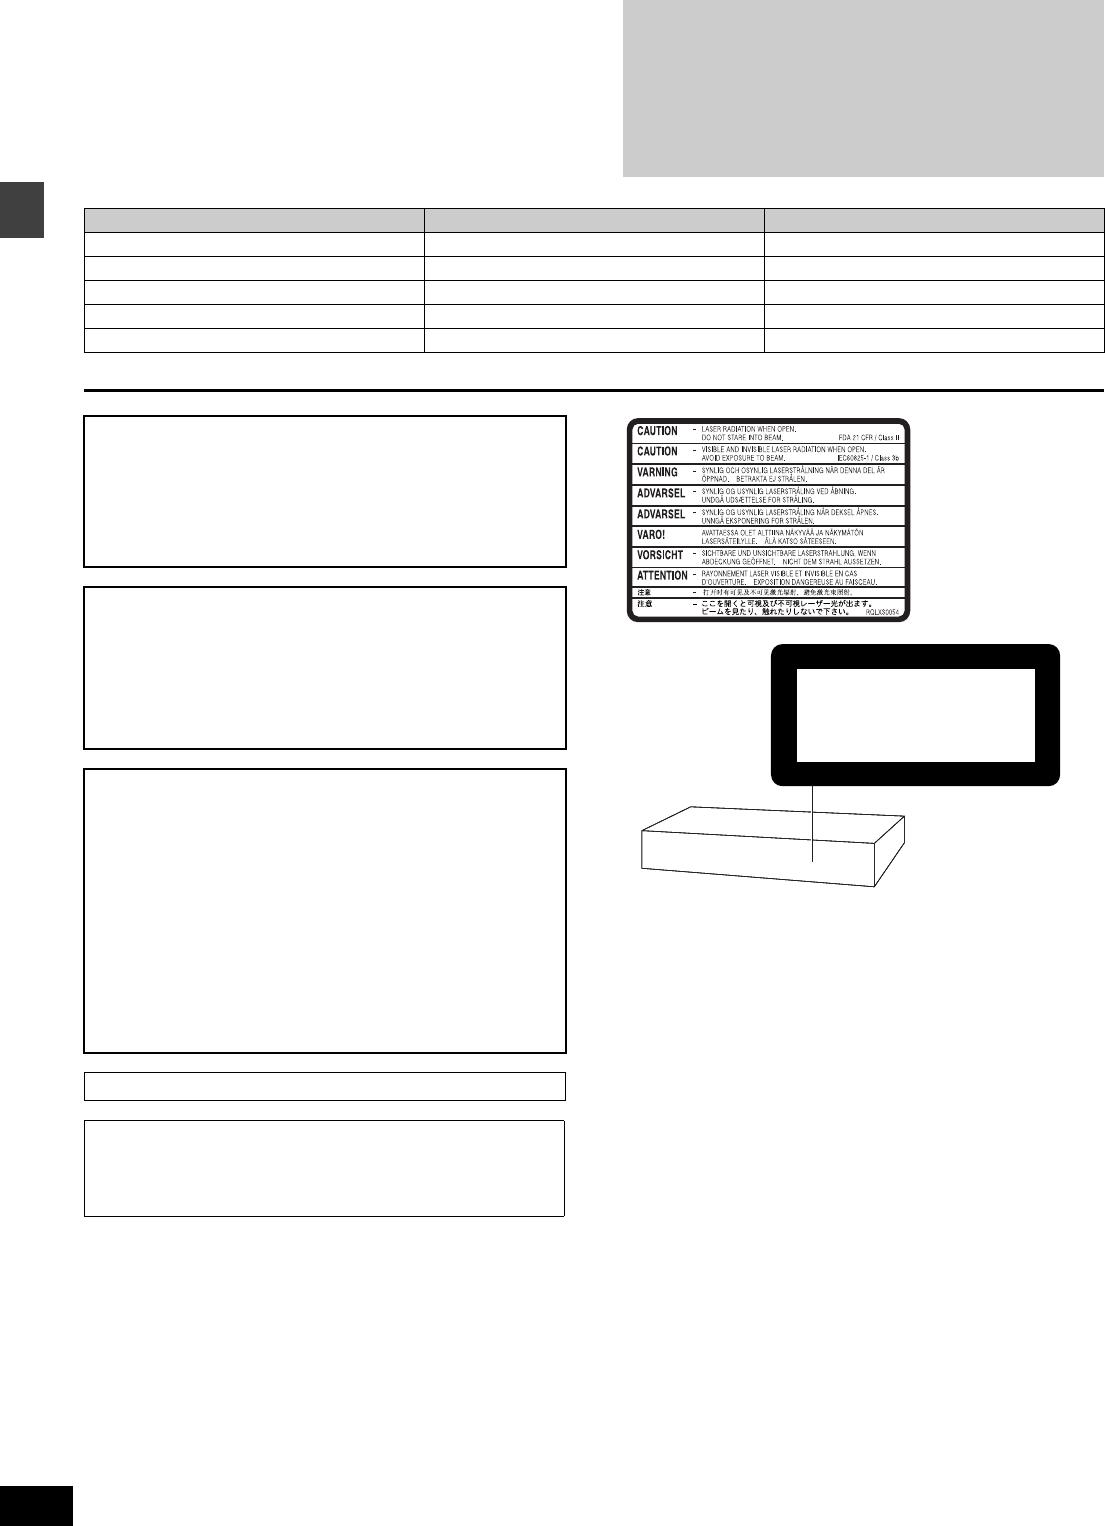 Handleiding Panasonic Sc Ht700 Pagina 1 Van 44 English Bsi Microphone Wiring Diagram 2